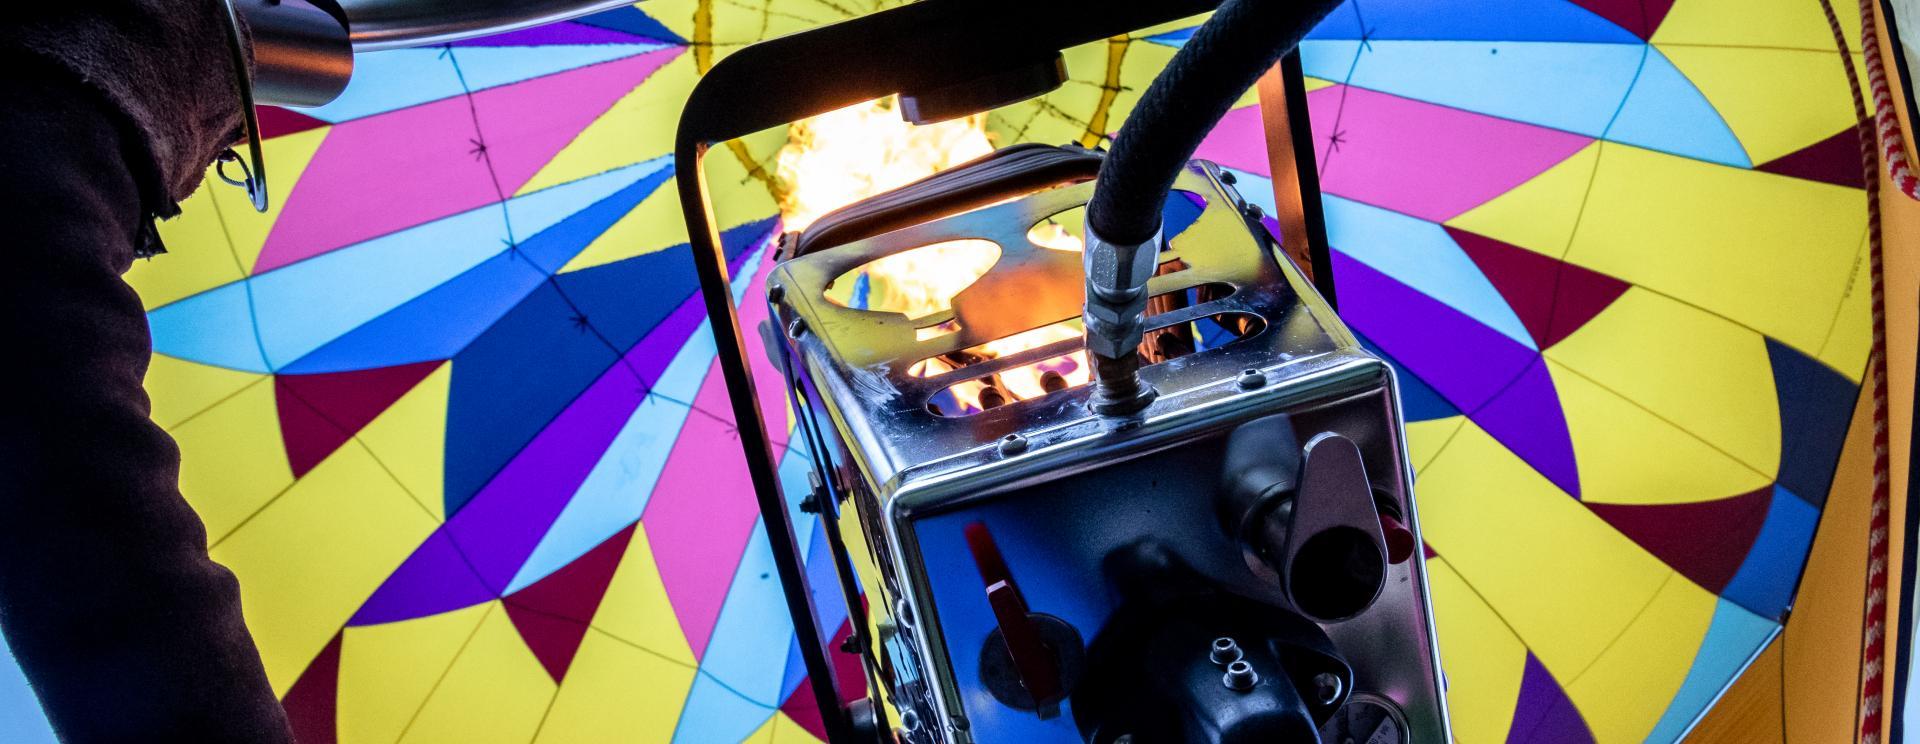 Western Horizons Hot Air Balloons